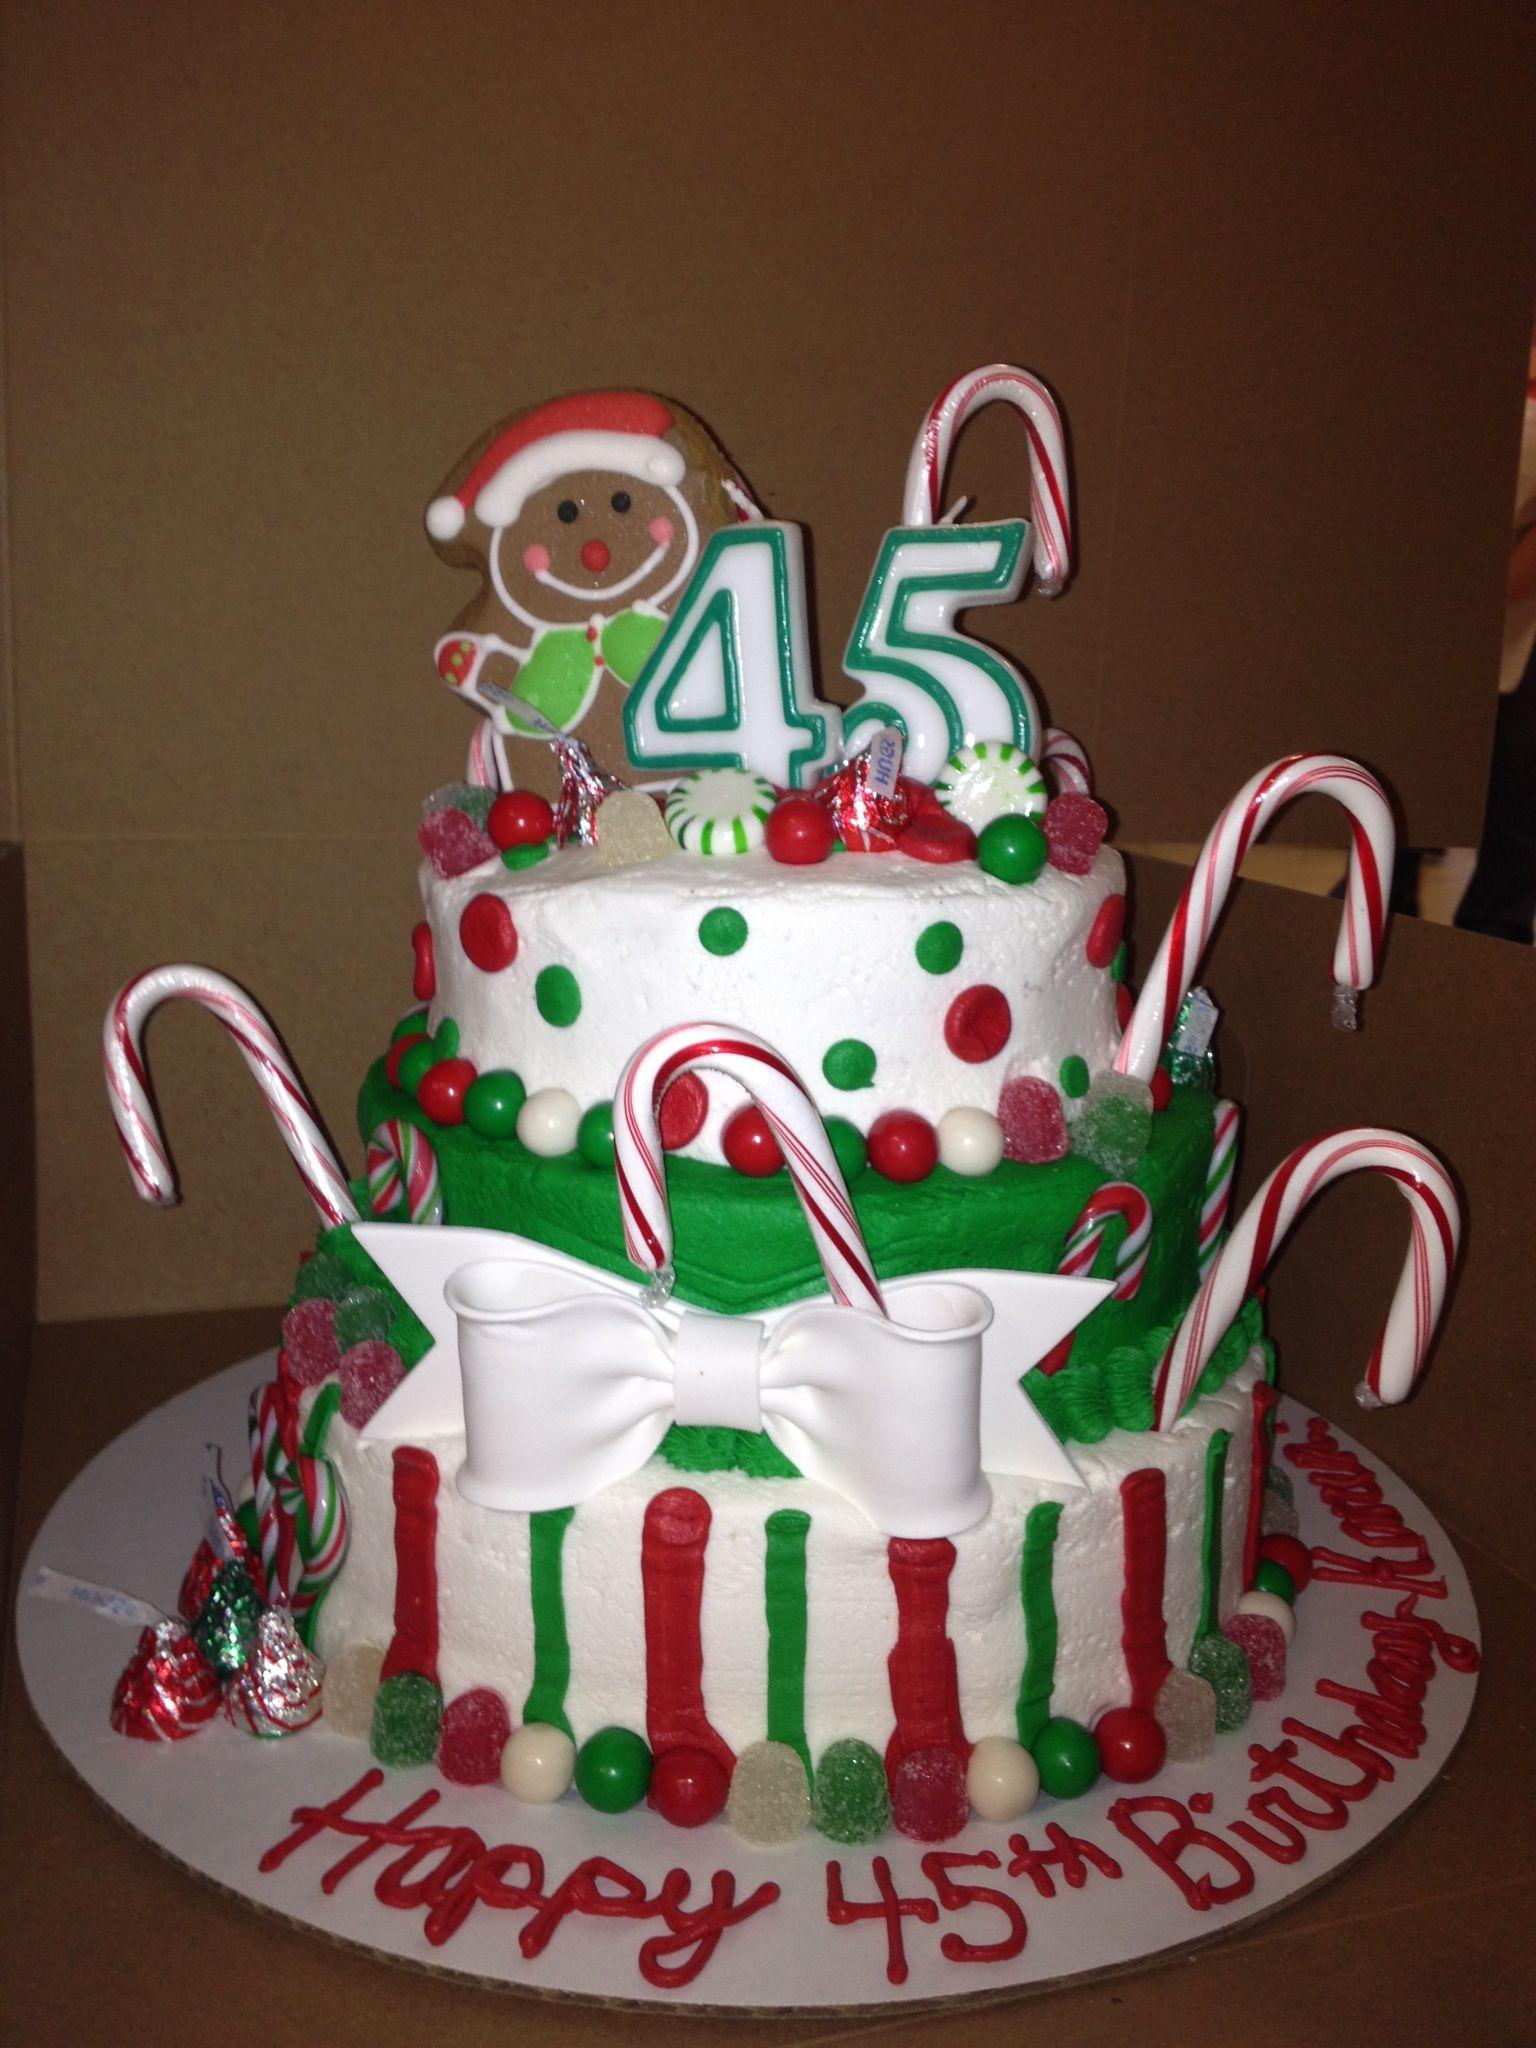 Christmas Themed Birthday Cake Do Dahs Donuts Creations